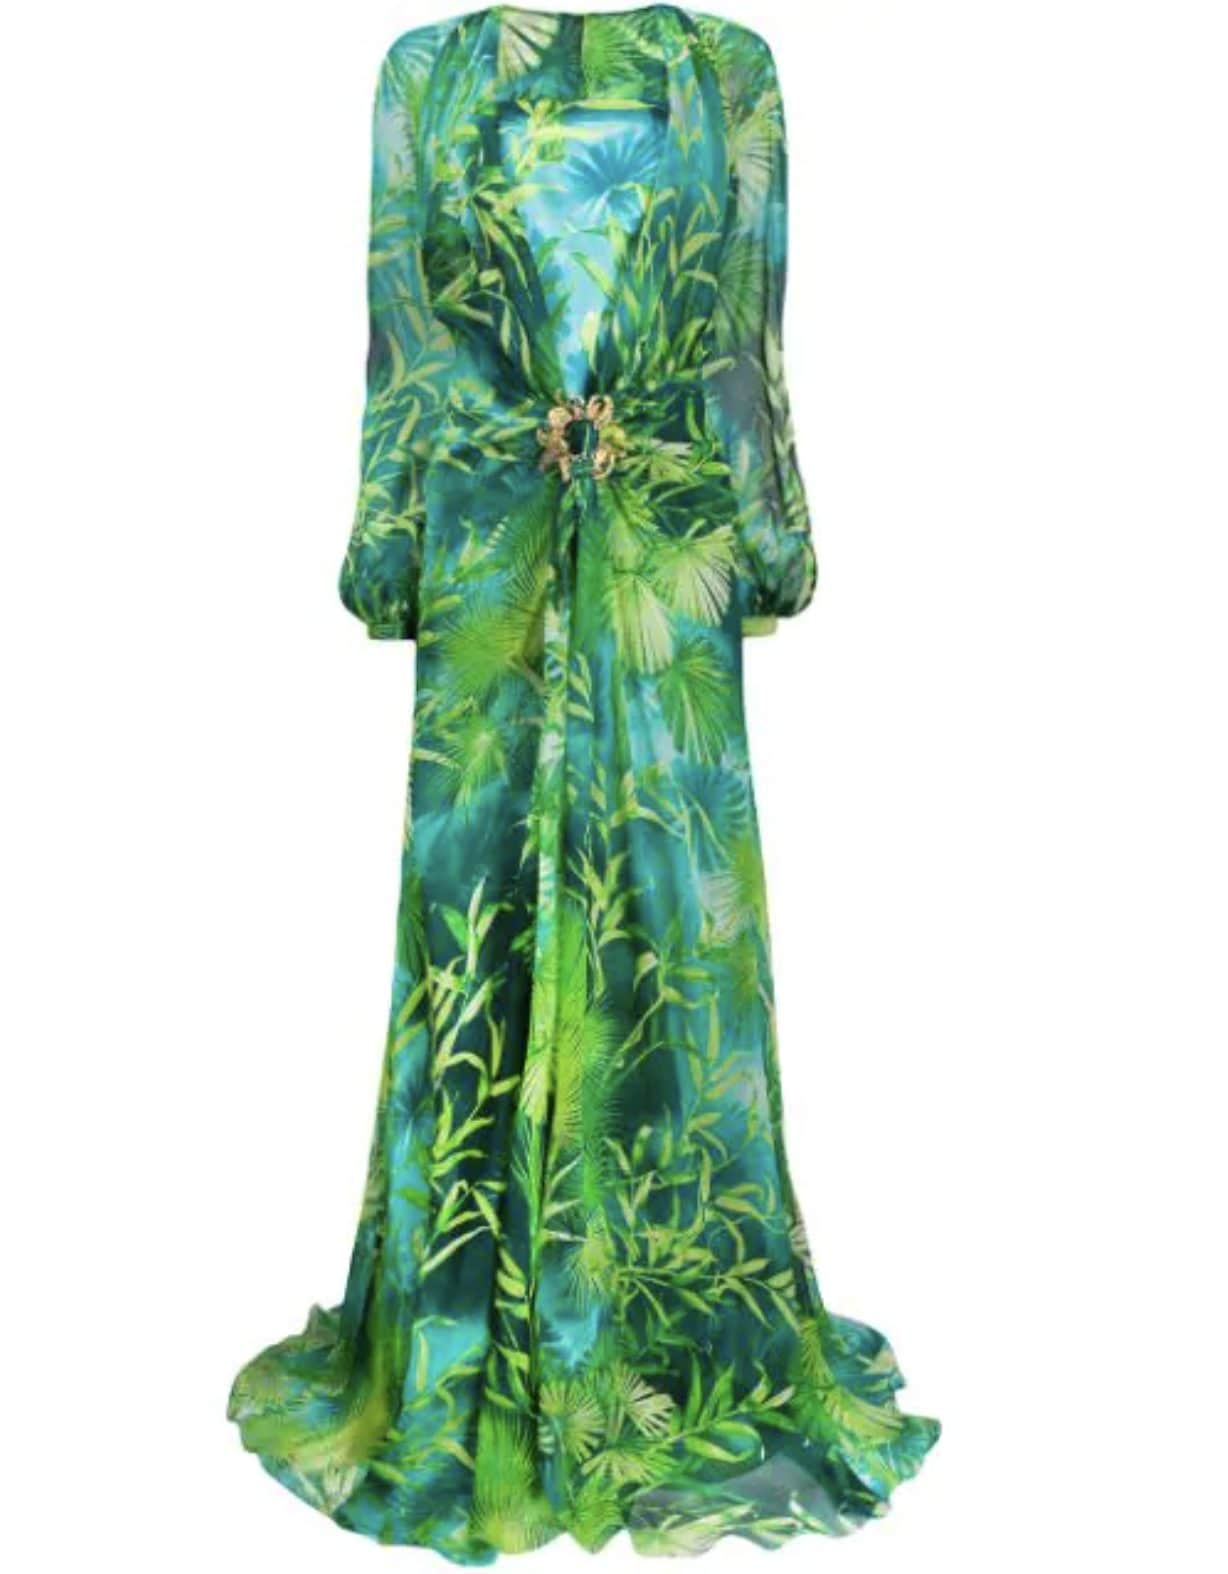 Il celebre Jungle Dress Versace